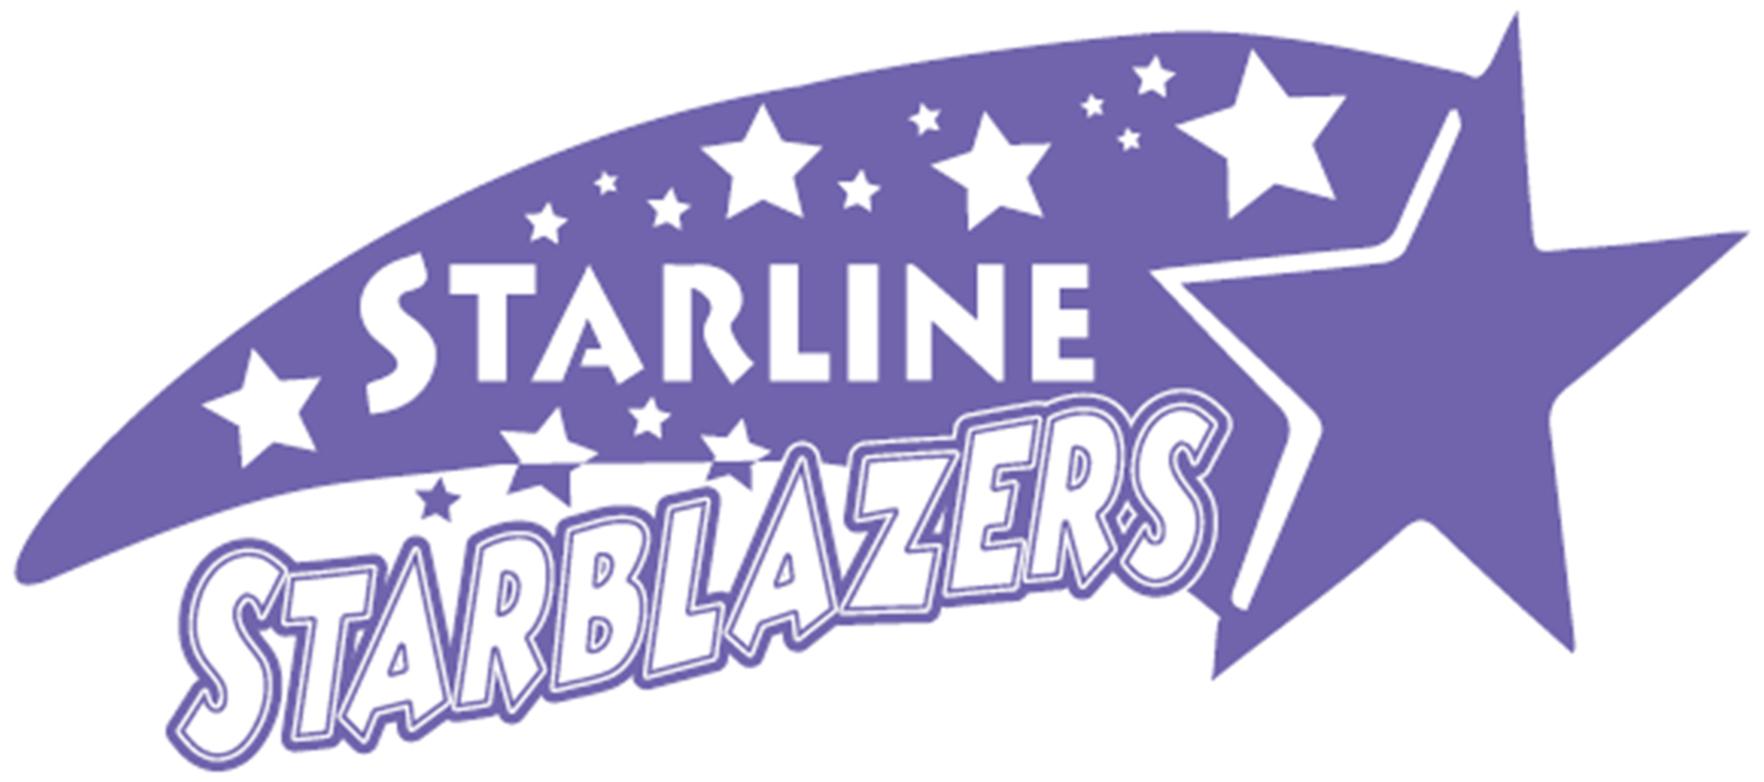 Starline Elementary Starblazers